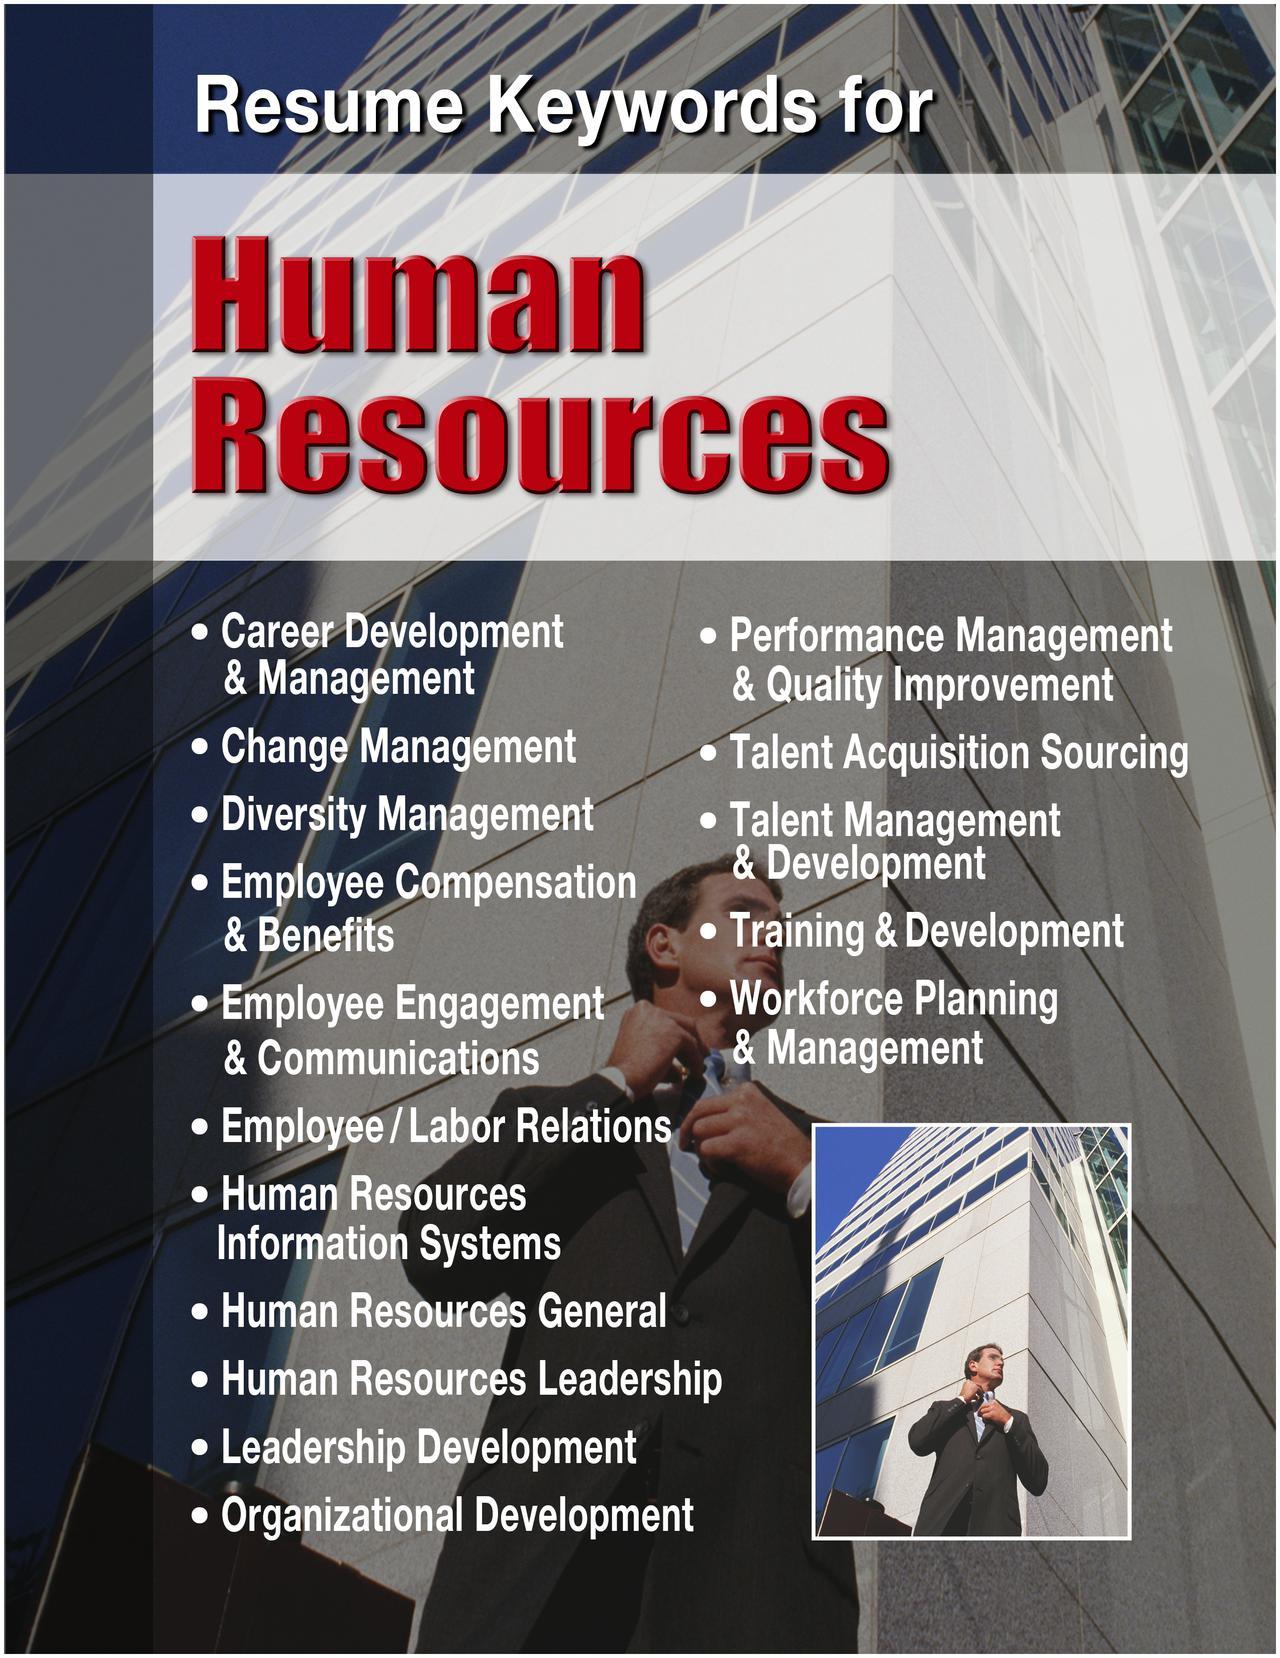 human resources divider.jpg